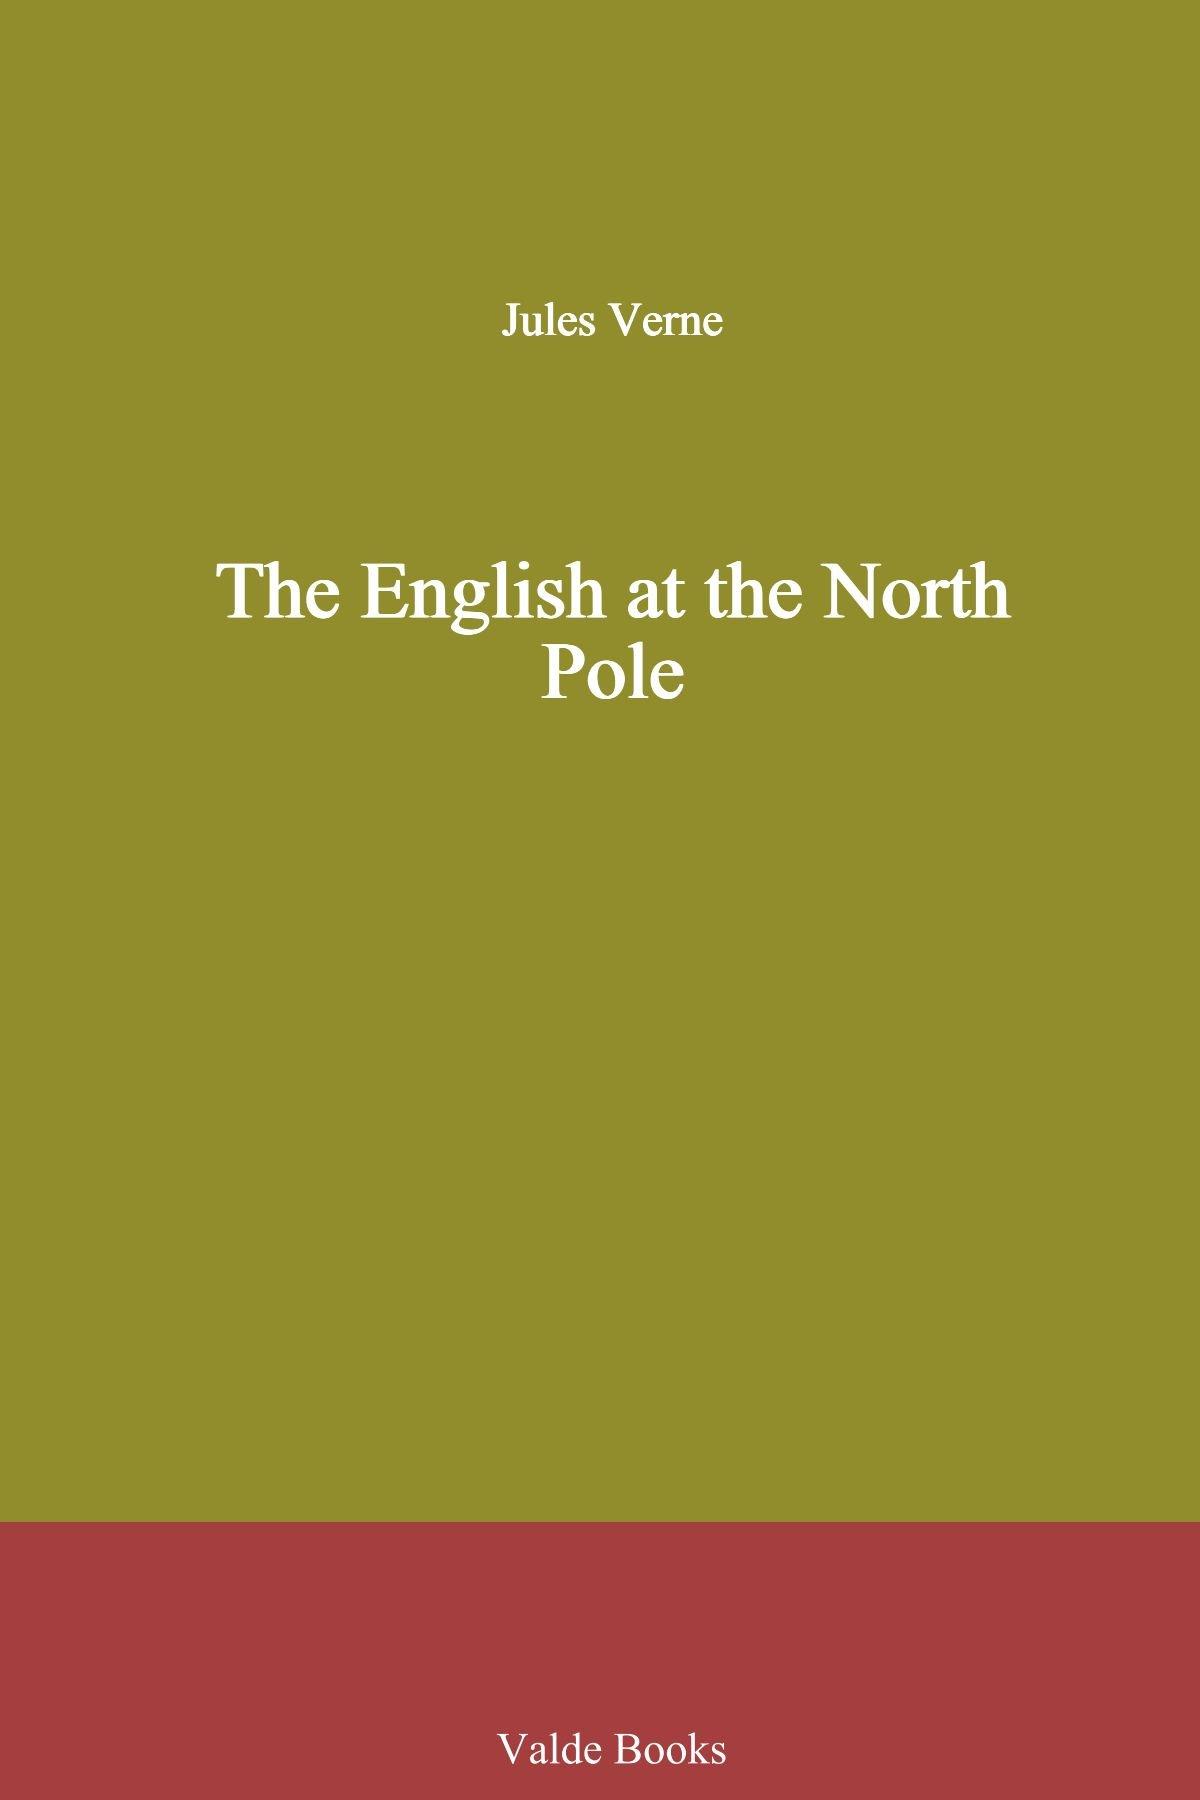 The English at the North Pole pdf